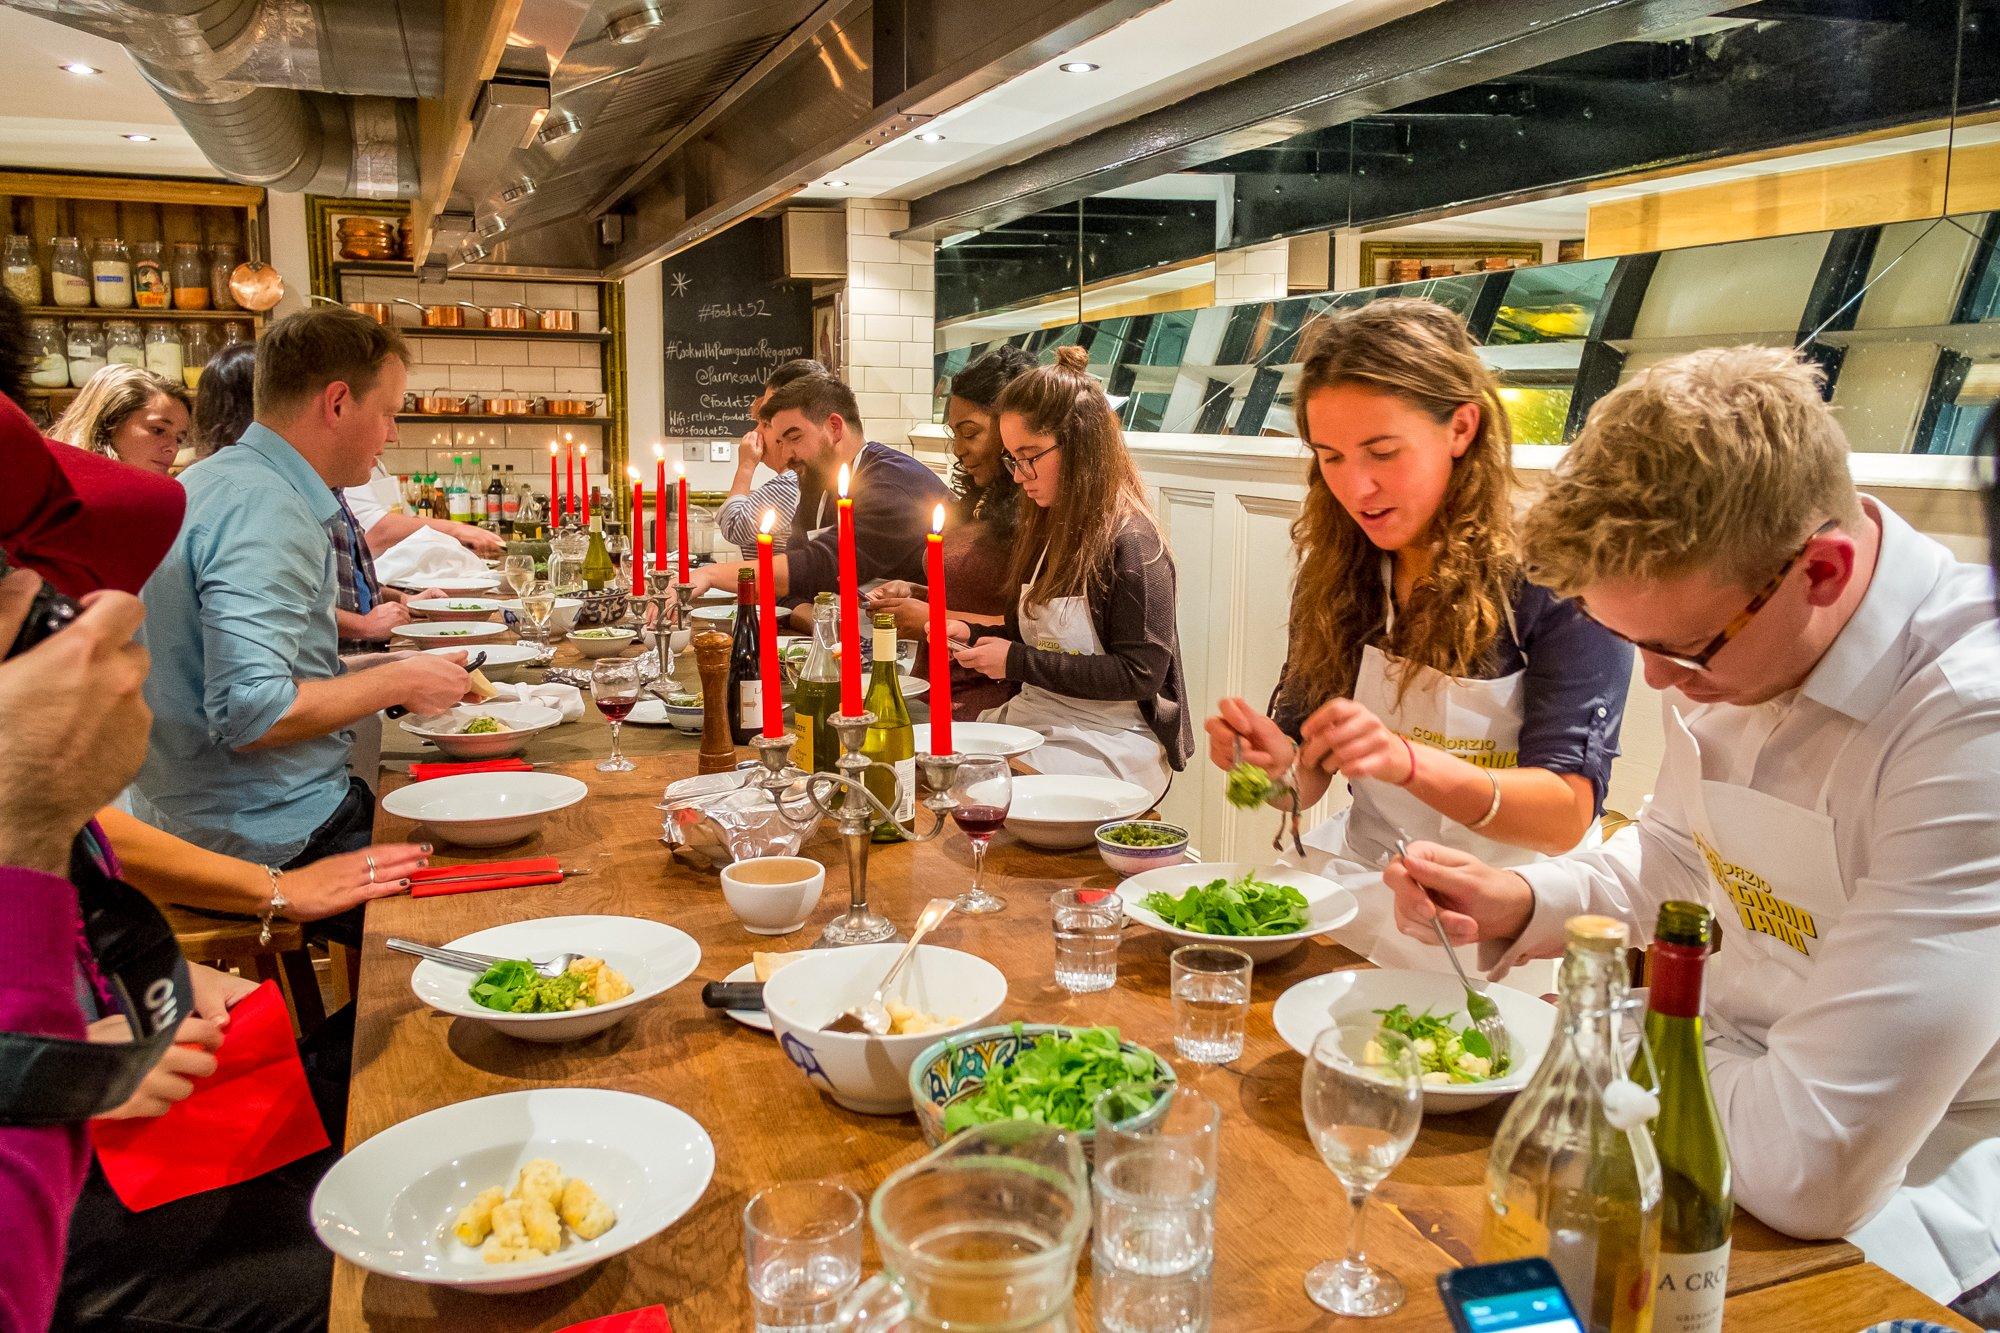 An evening with Parmigiano Reggiano